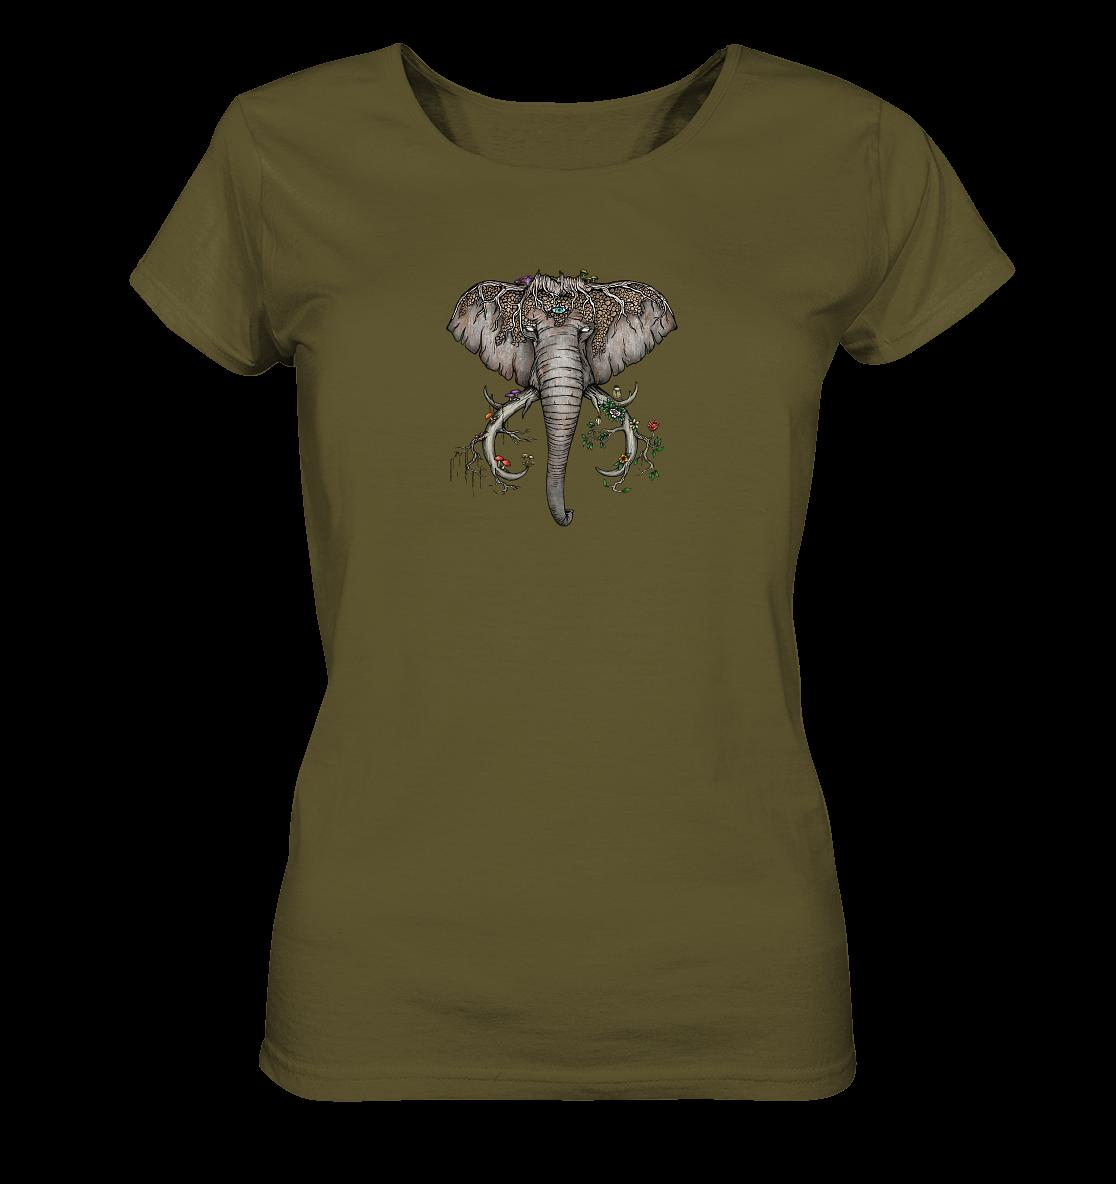 front-ladies-organic-shirt-5e5530-1116x-1.png